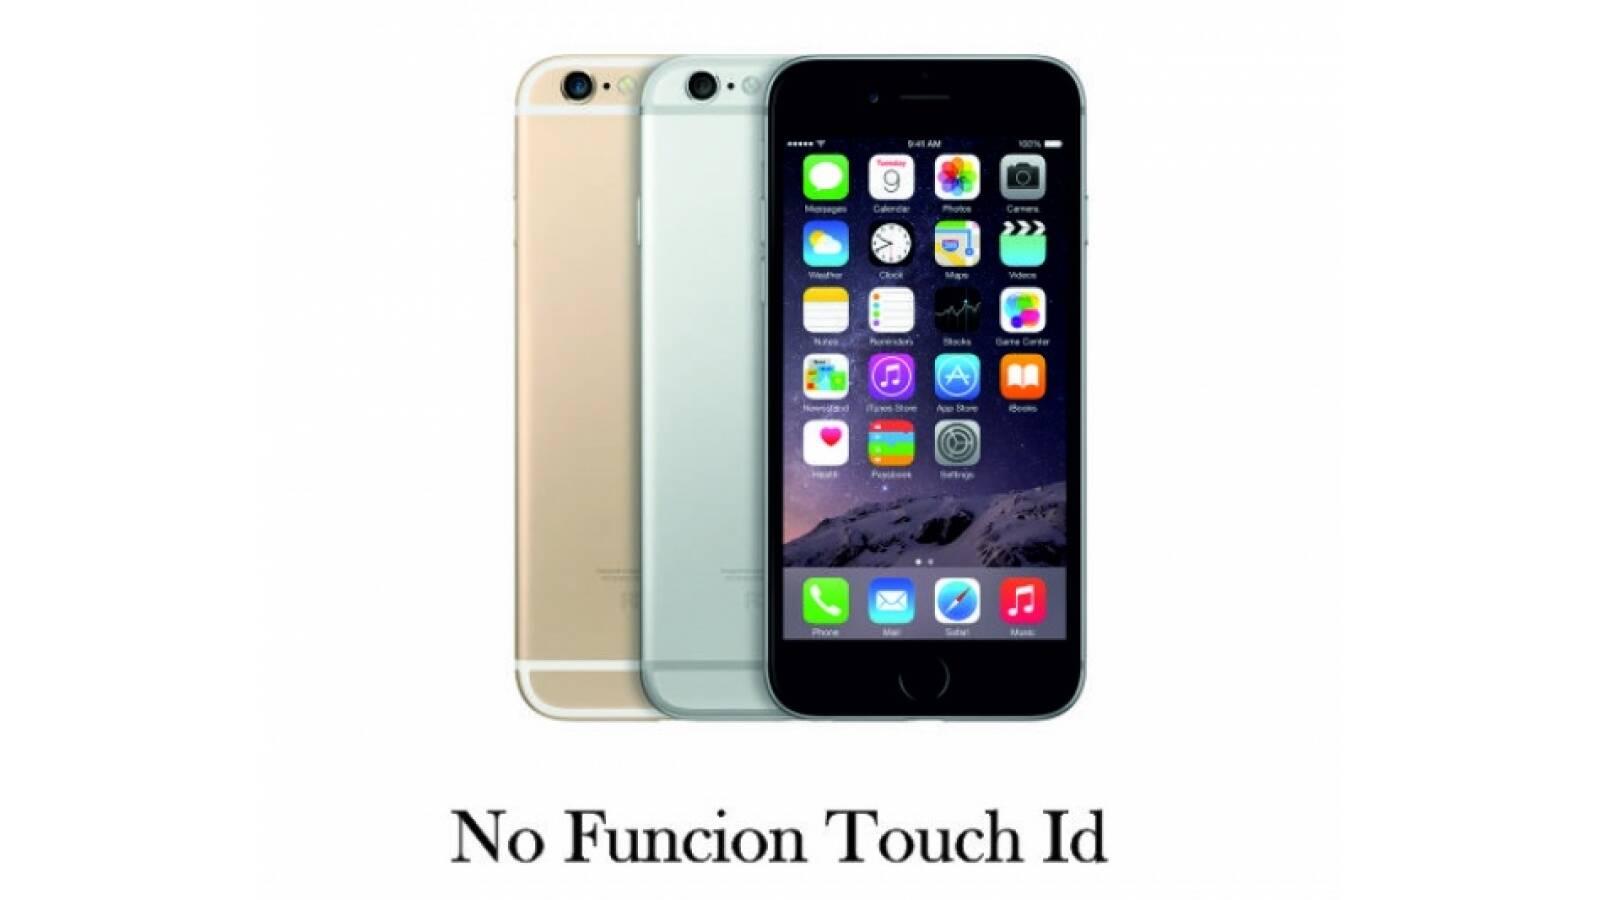 Apple Iphone 6 64gb Libre - No Funciona Touch Id